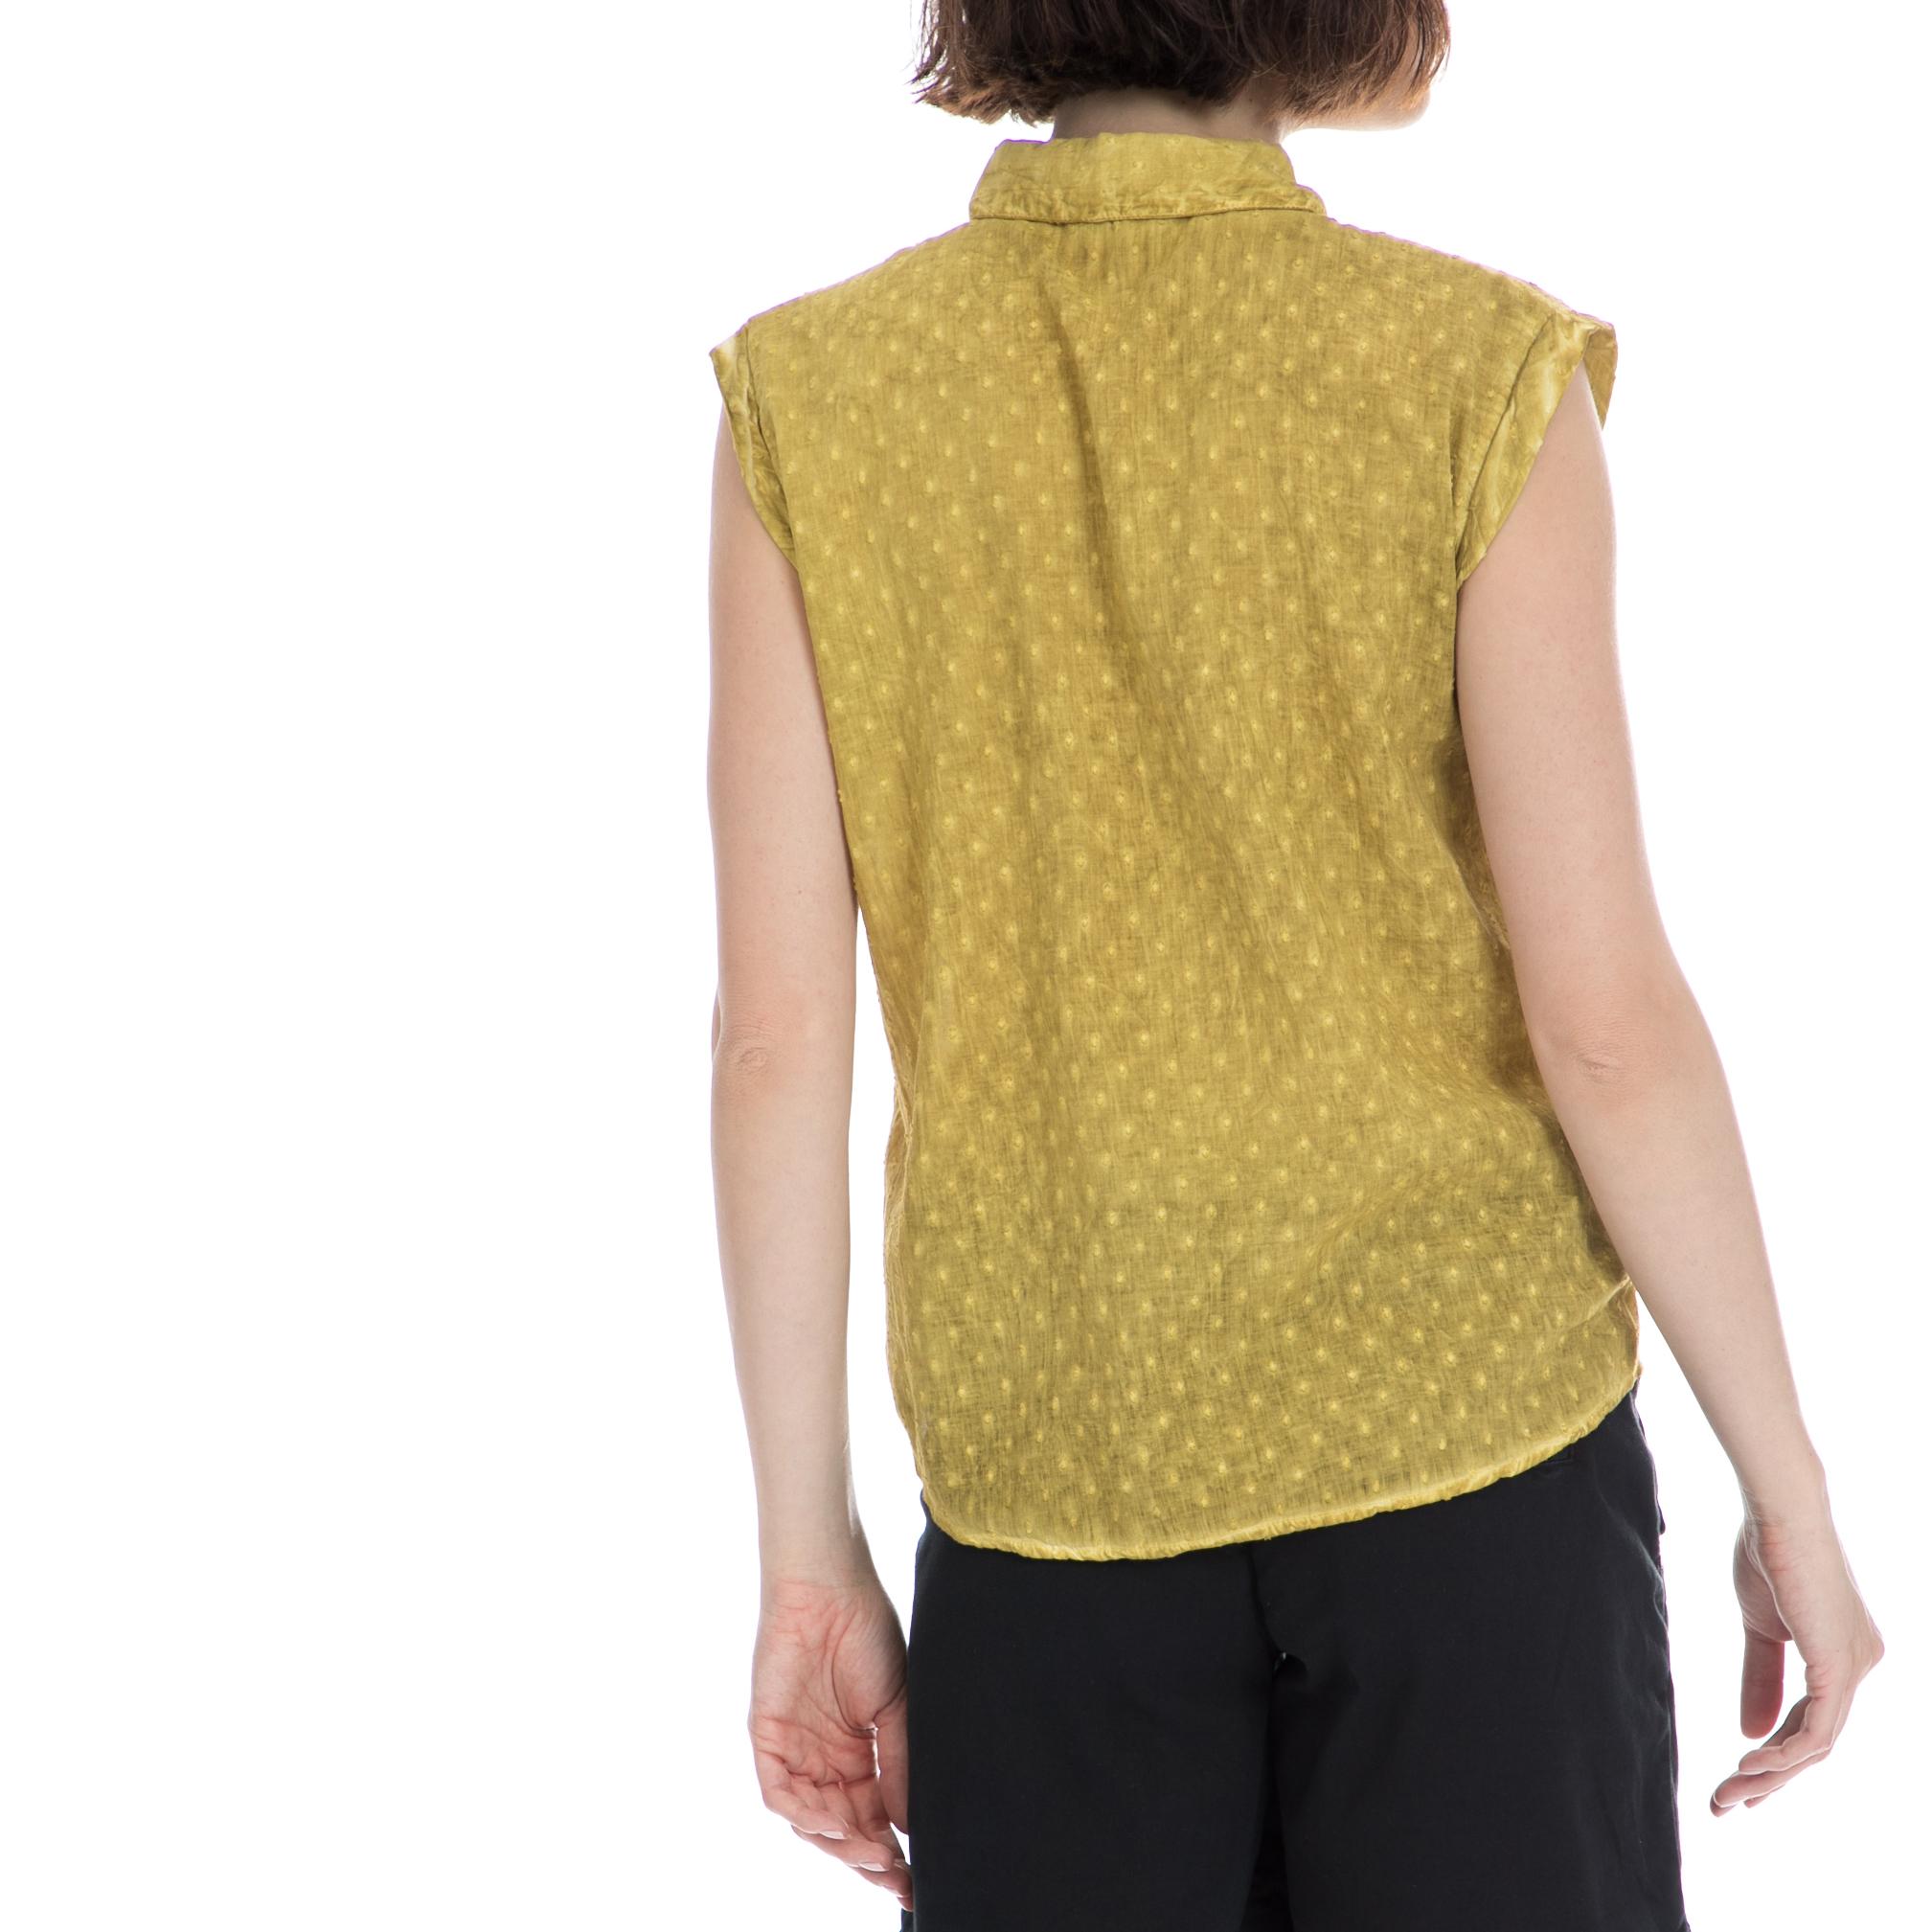 1920d11d24f9 GARCIA JEANS - Γυναικείο πουκάμισο Garcia Jeans κίτρινο